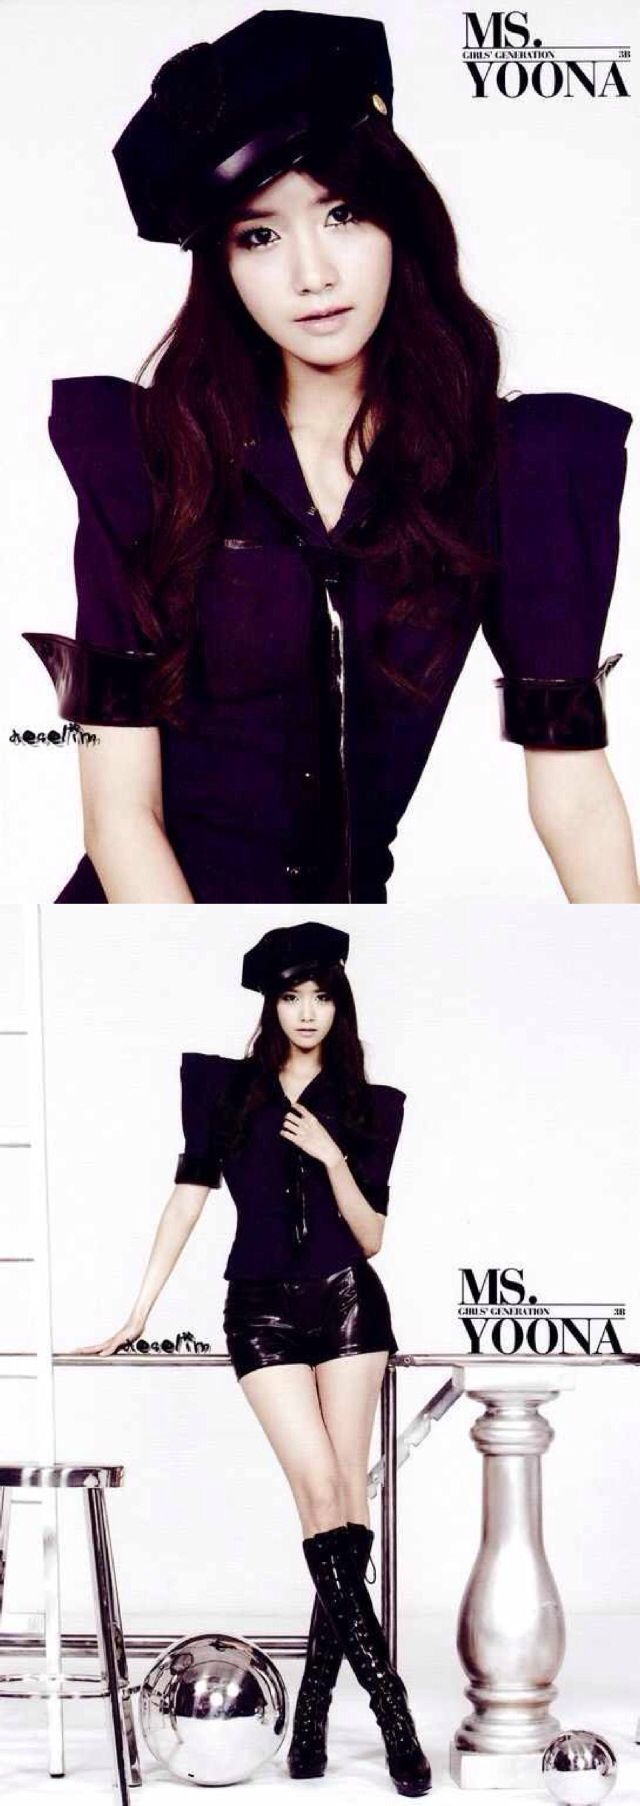 1000+ images about Yoona/Bom/Qri♡ on Pinterest | Yoona ...